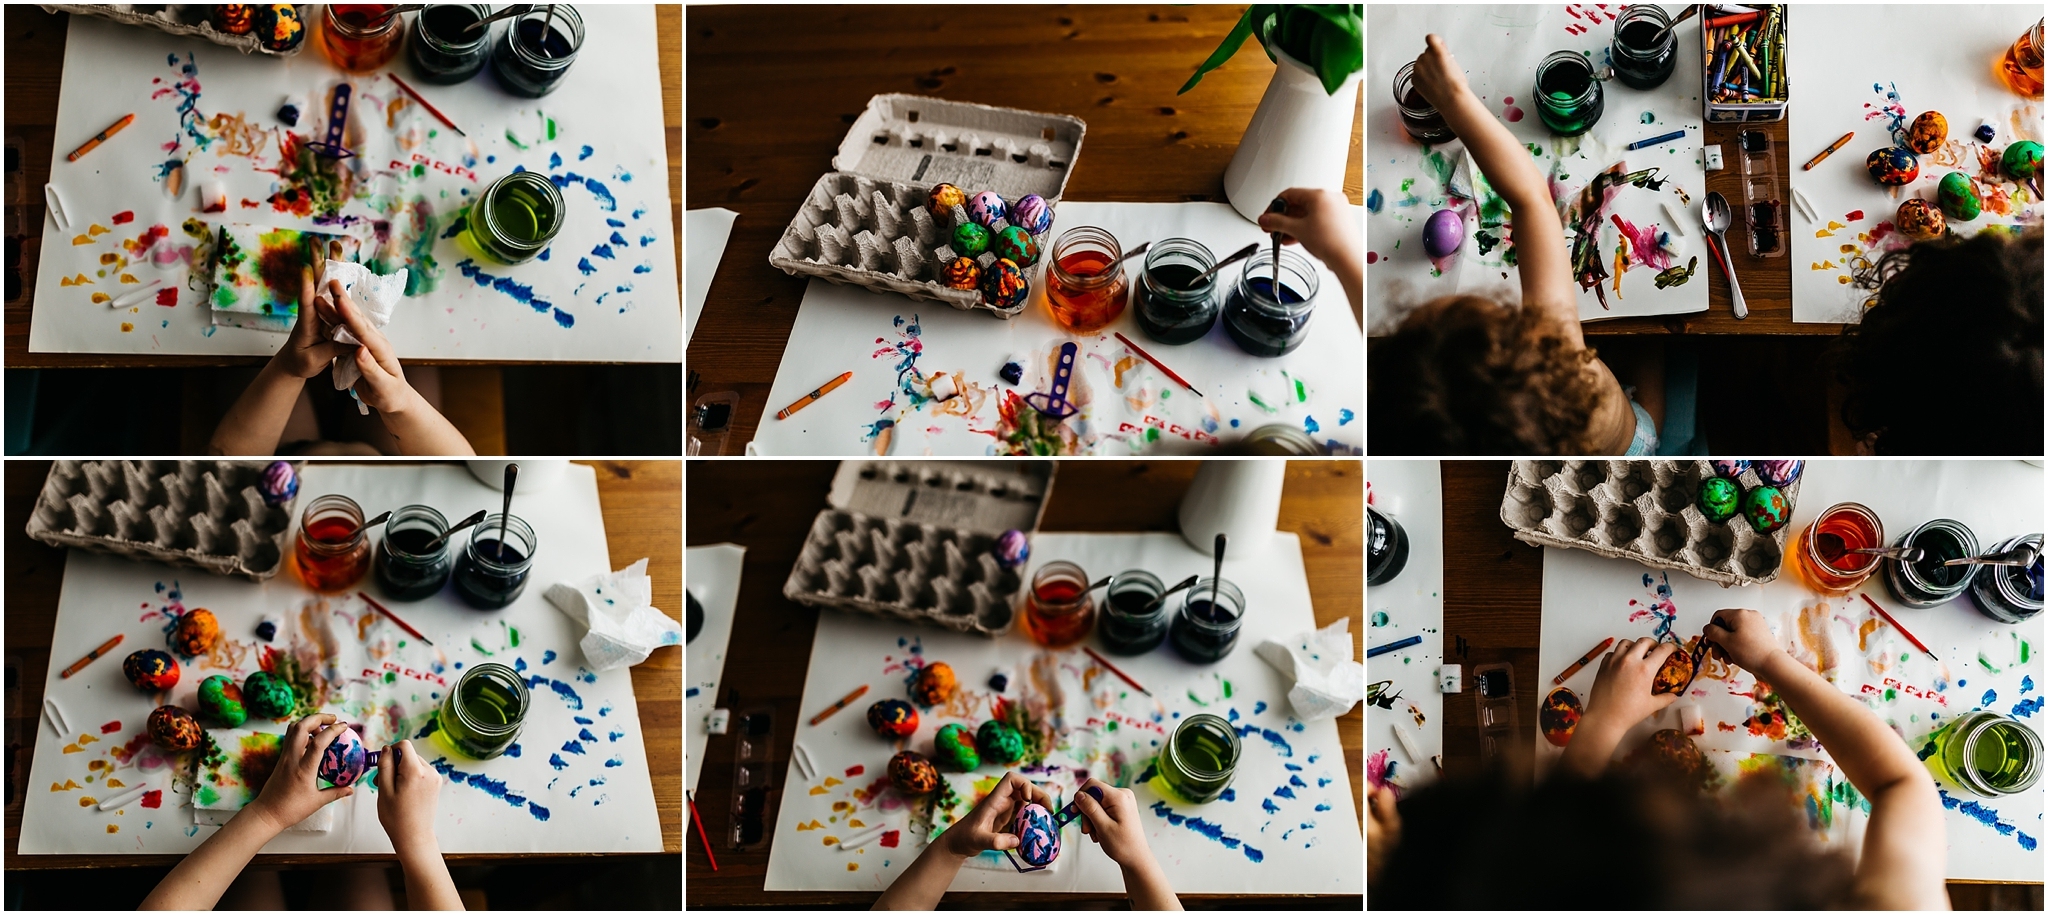 Easter Egg Painting - Edmonton Photographer - Edmonton Family Photographer -  Easter Eggs - Easter 2018 - Crayons on Easter Eggs - Edmonton Documentary Photographer - Family Photography - Documentary Photography - Spring - Kids Crafts - Rainbow - Easter egg making